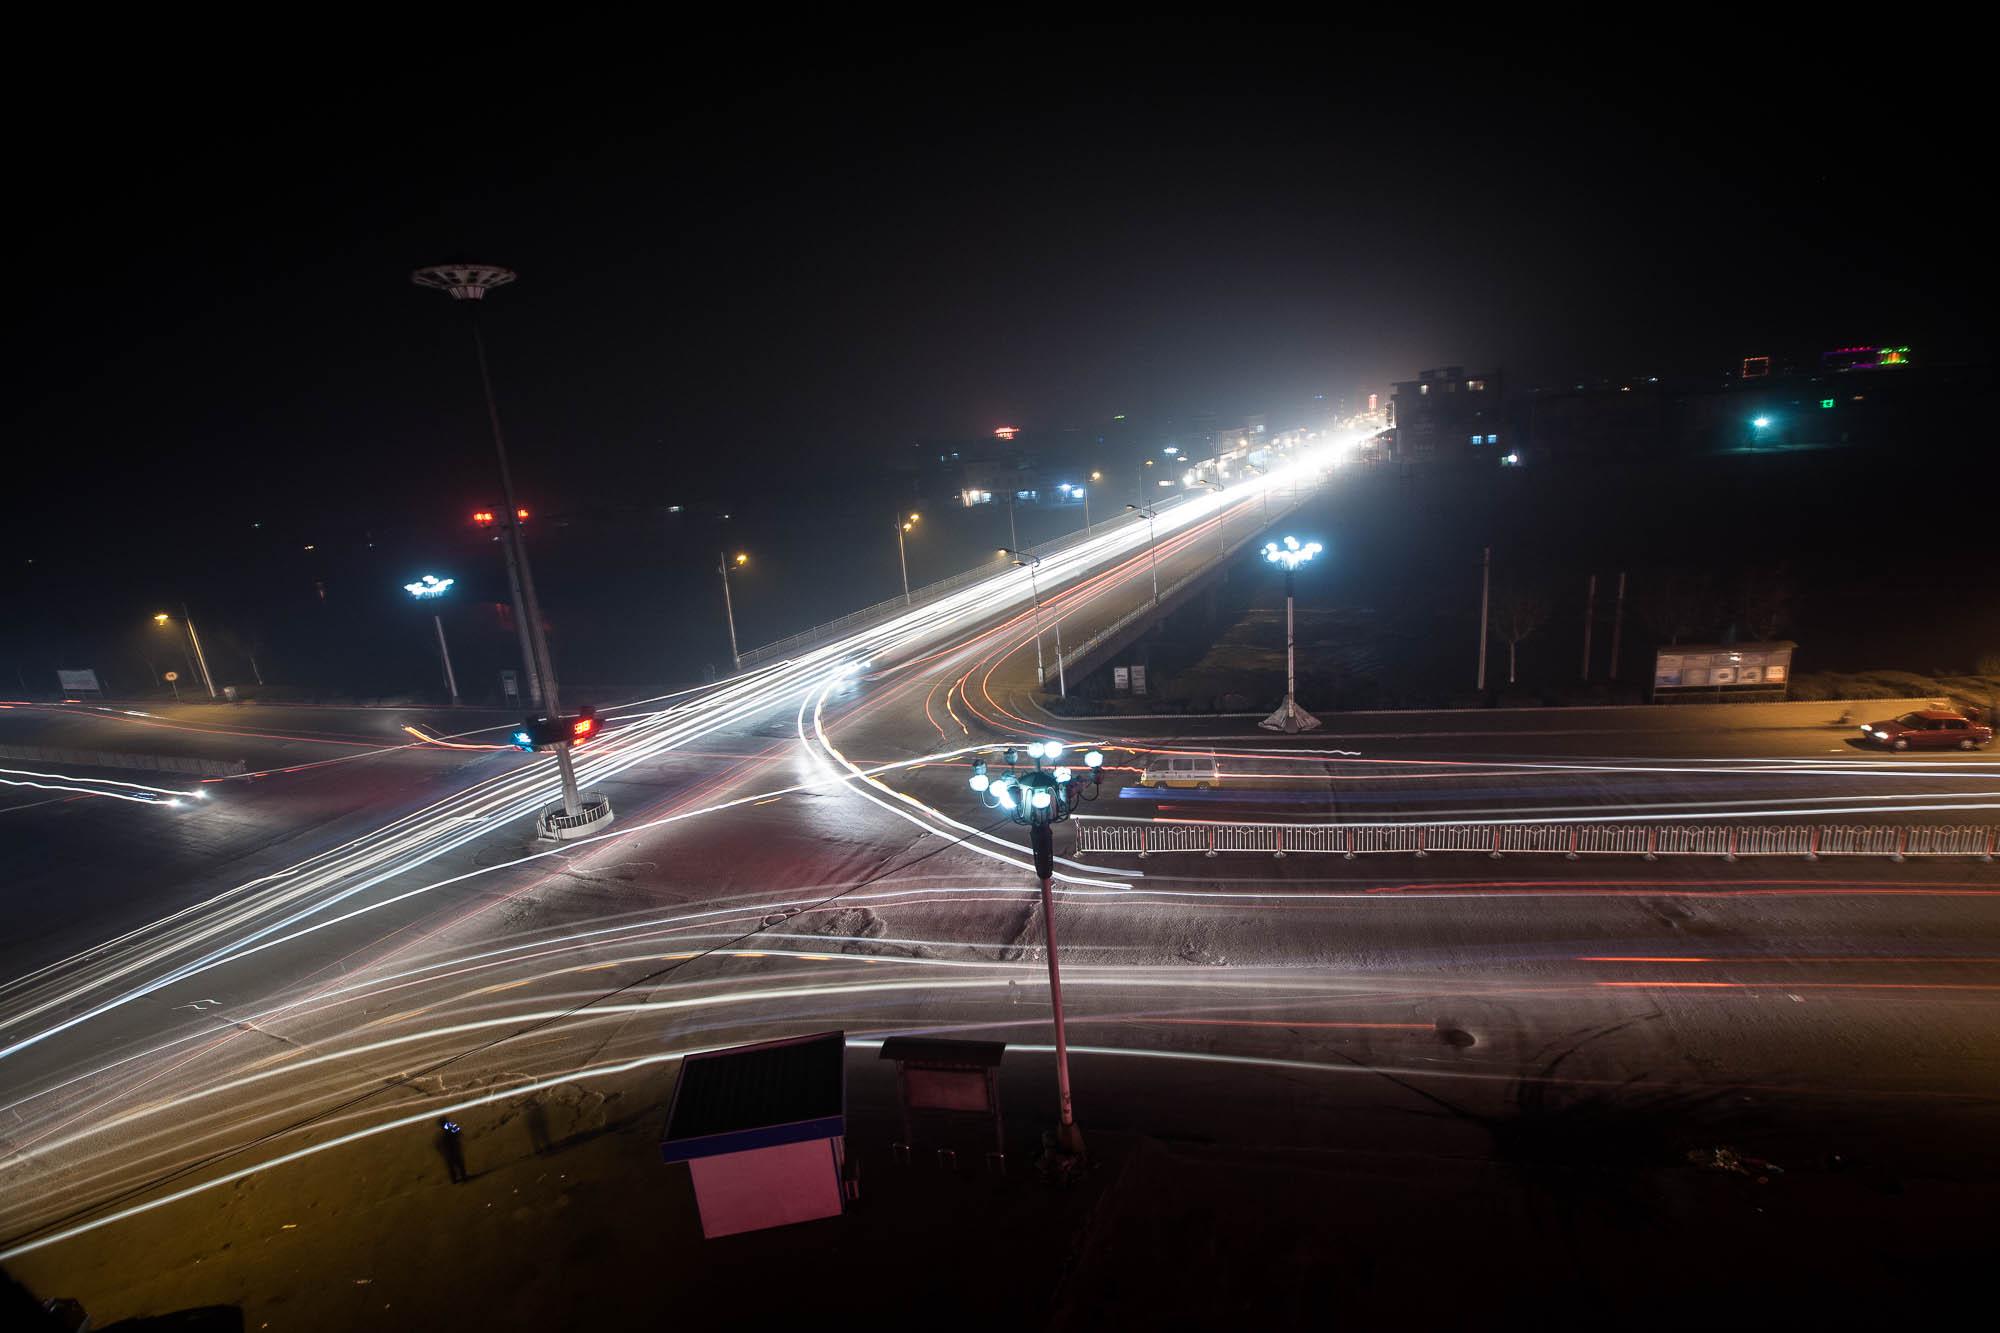 night traffic in Huozhou